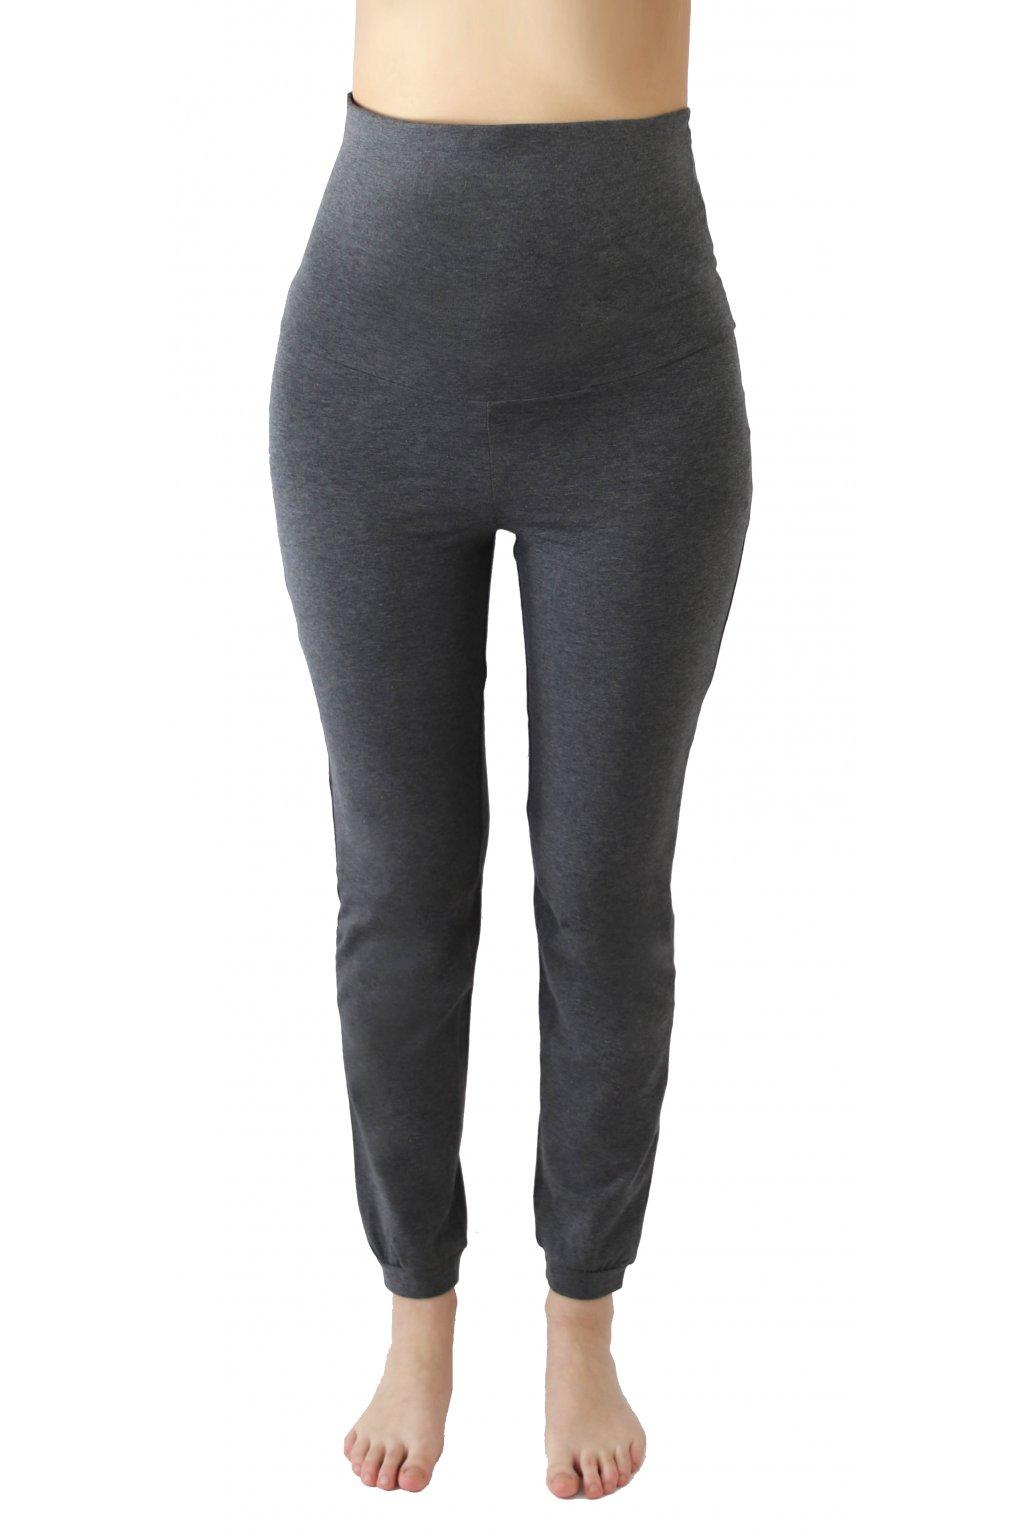 Kalhoty na jógu - antracit/melange (Velikost L)